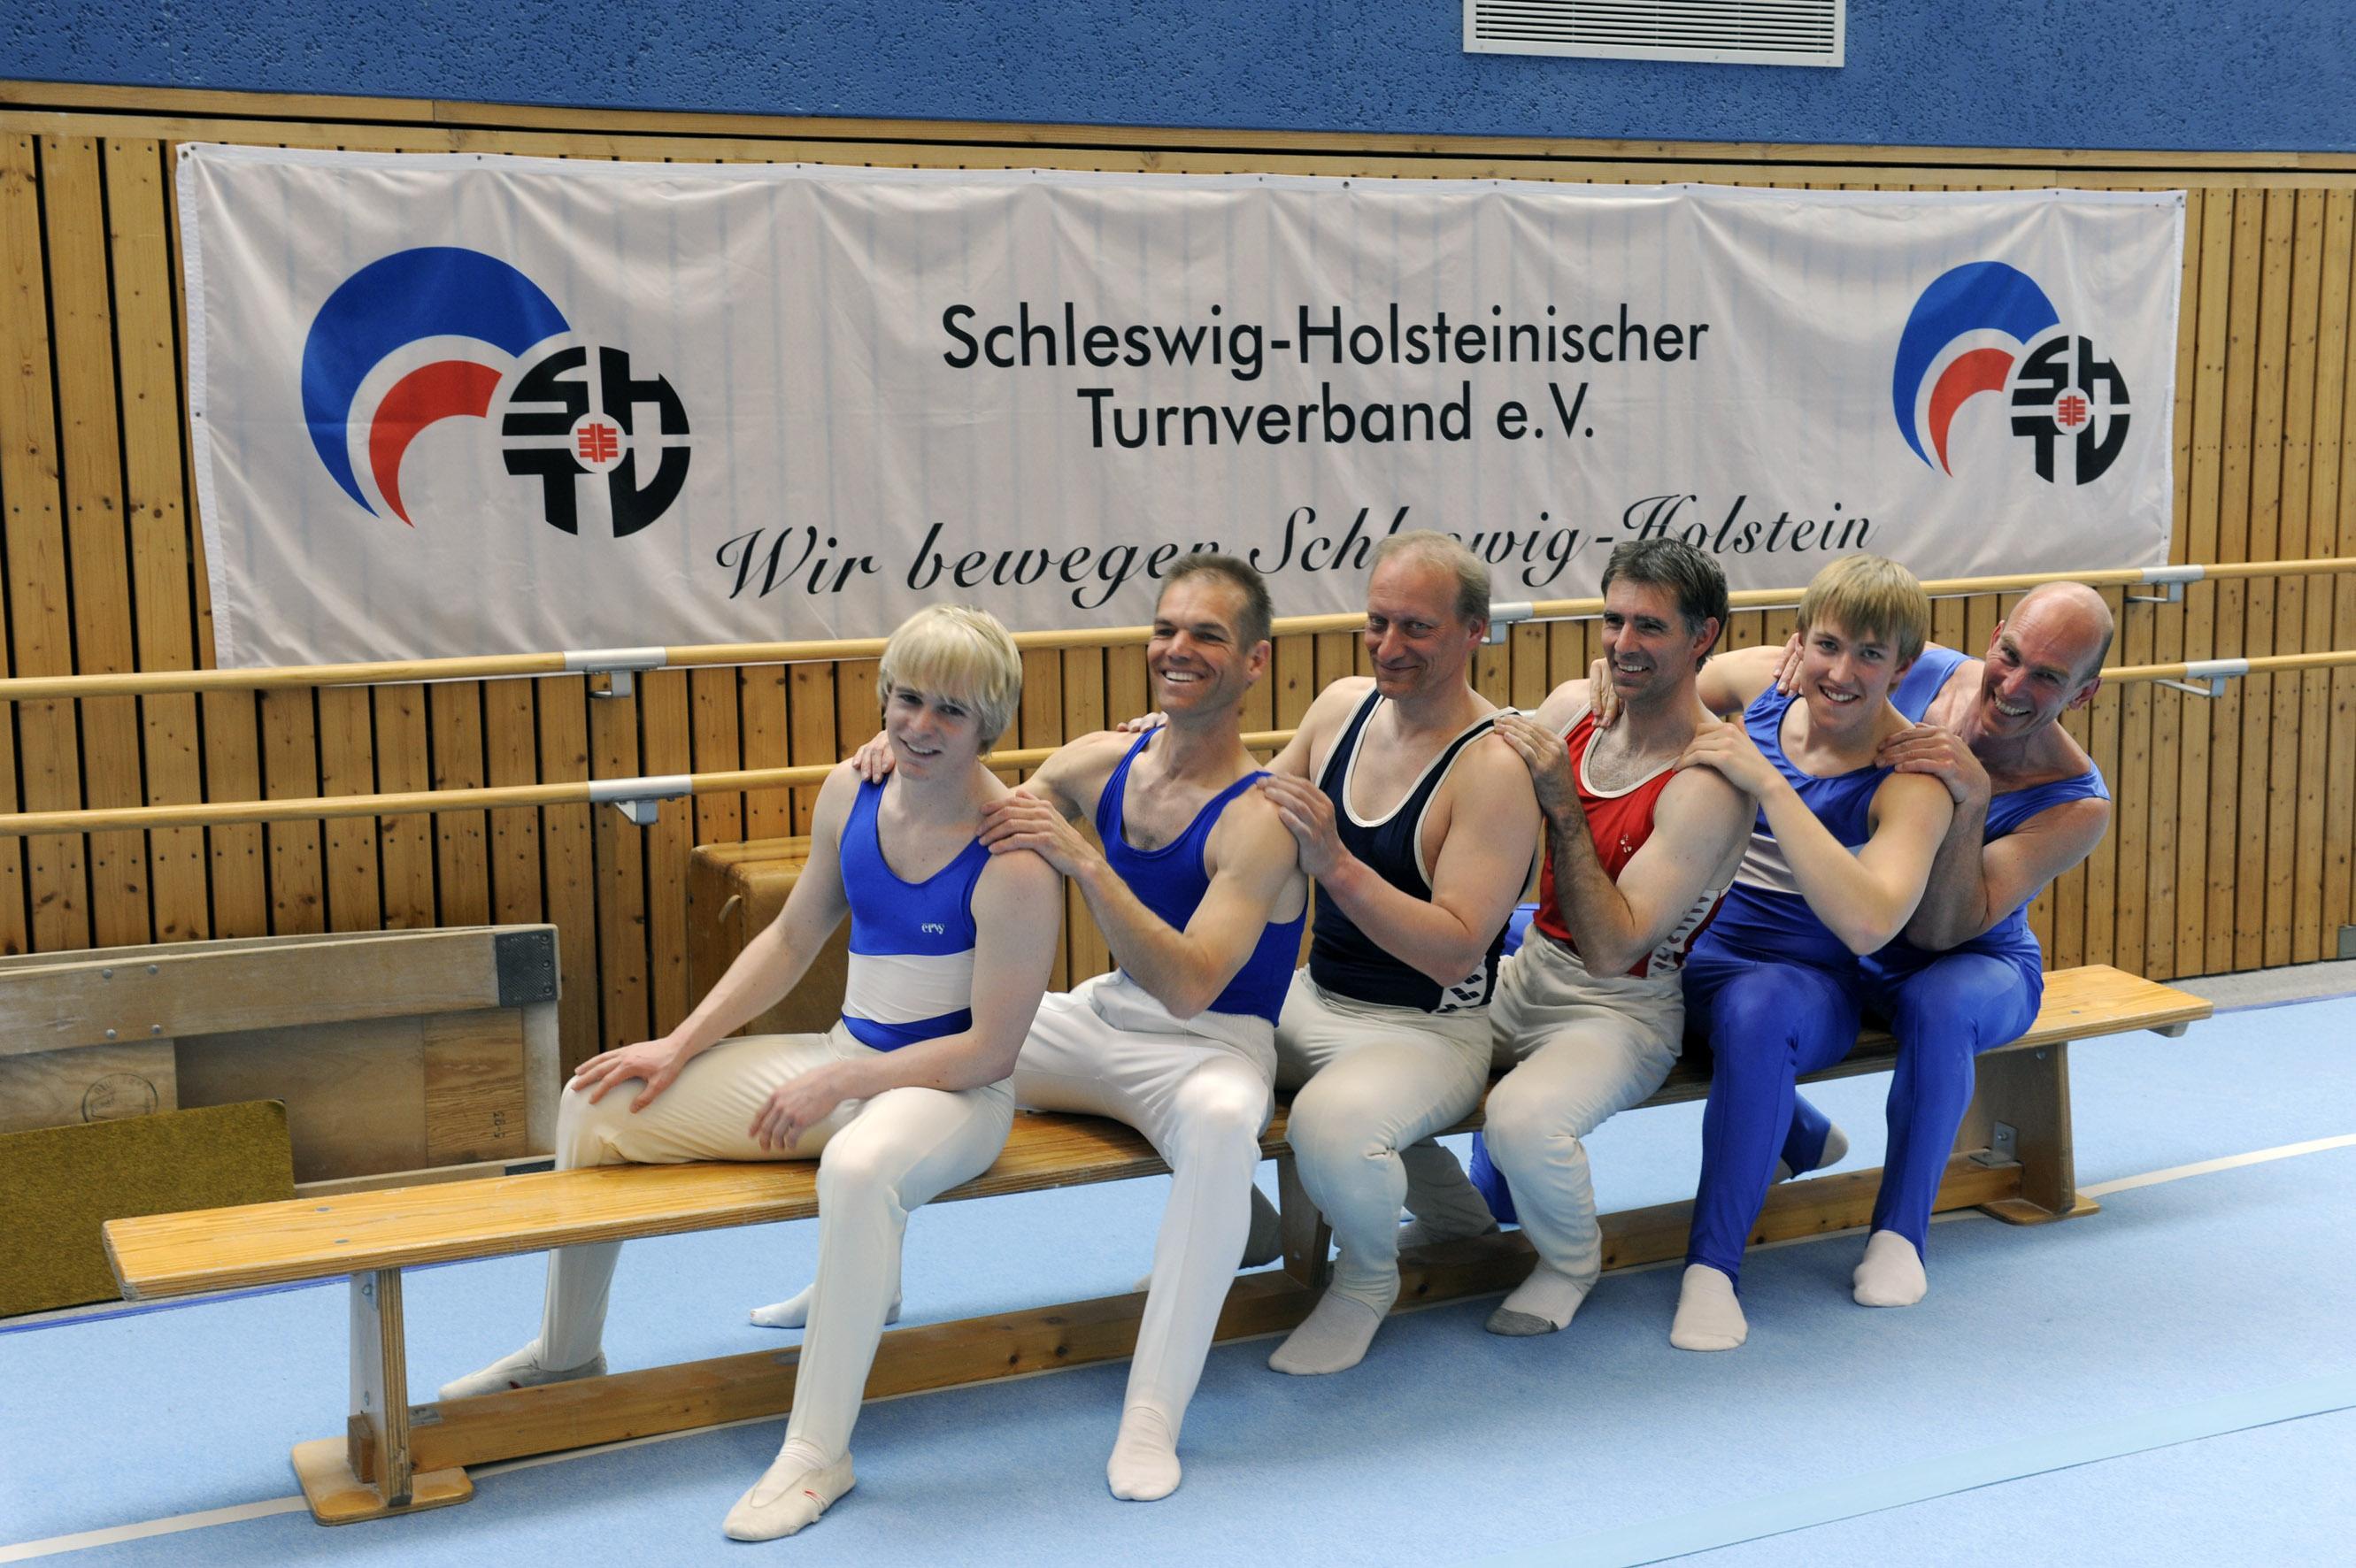 Gruppenbild-Turnen-08-2009